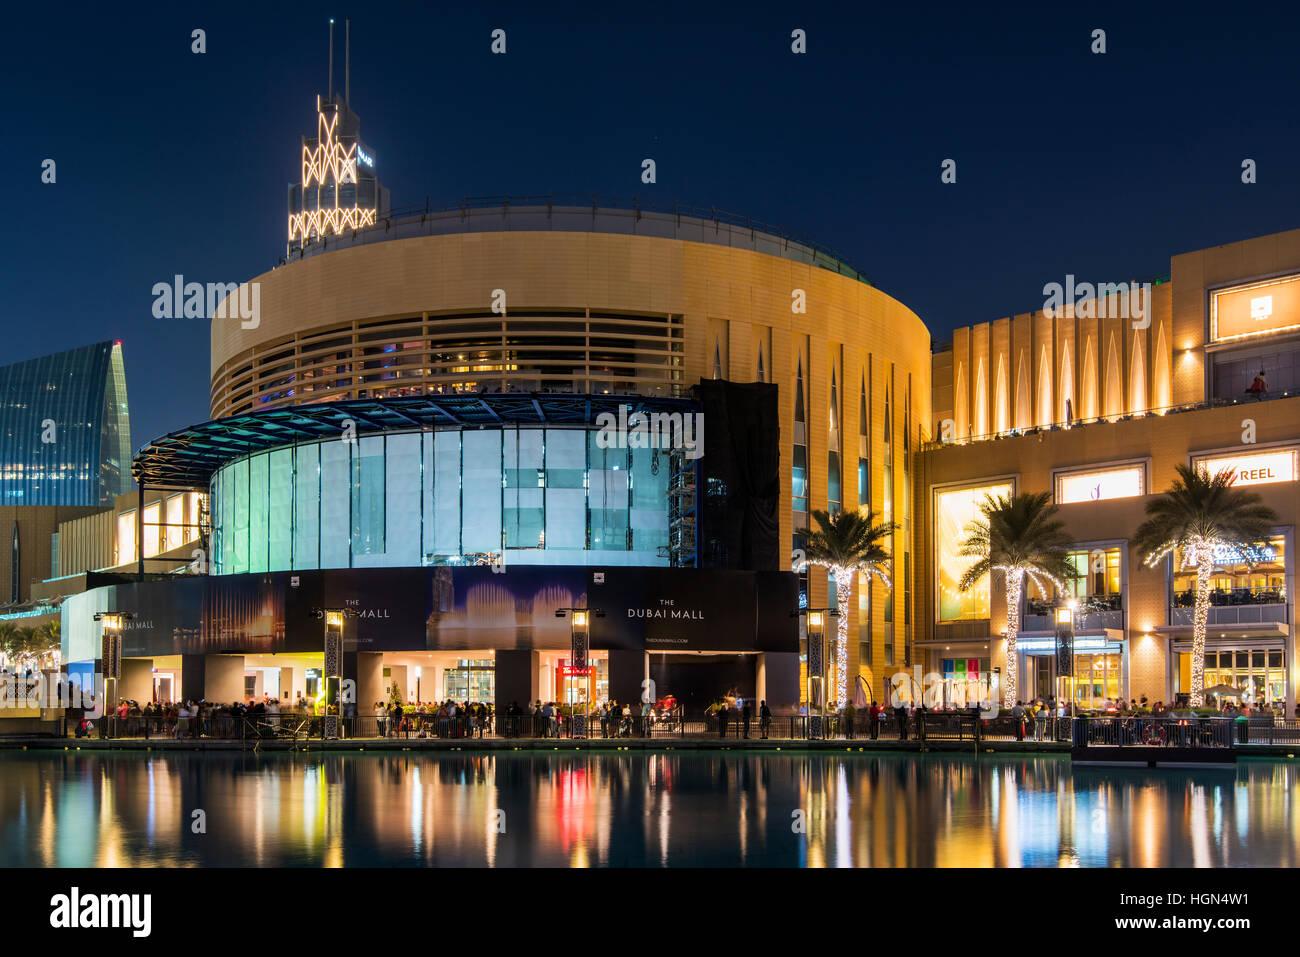 Night view of Dubai Mall, Dubai, United Arab Emirates - Stock Image